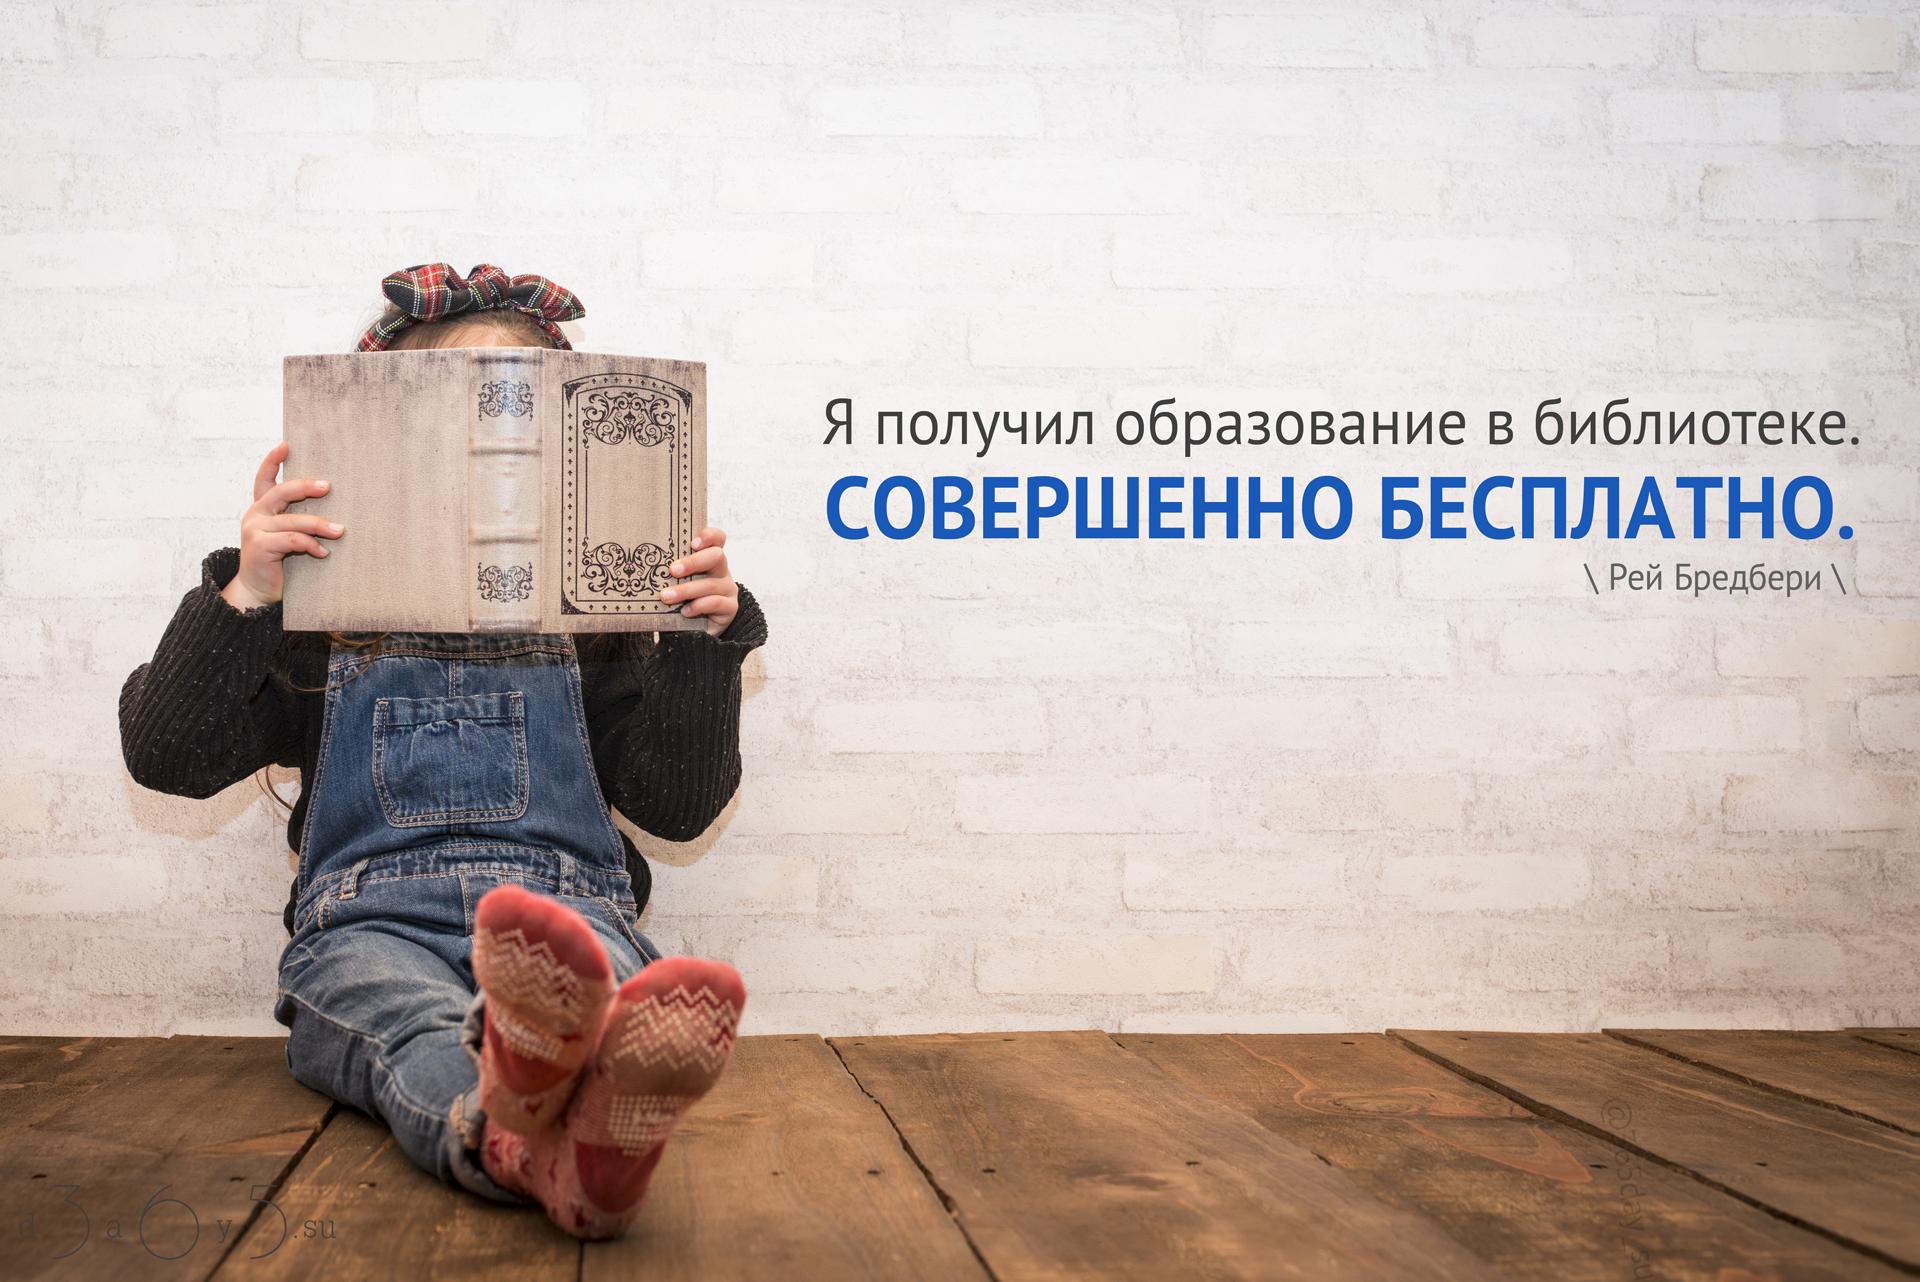 Цитата об образовании картинка